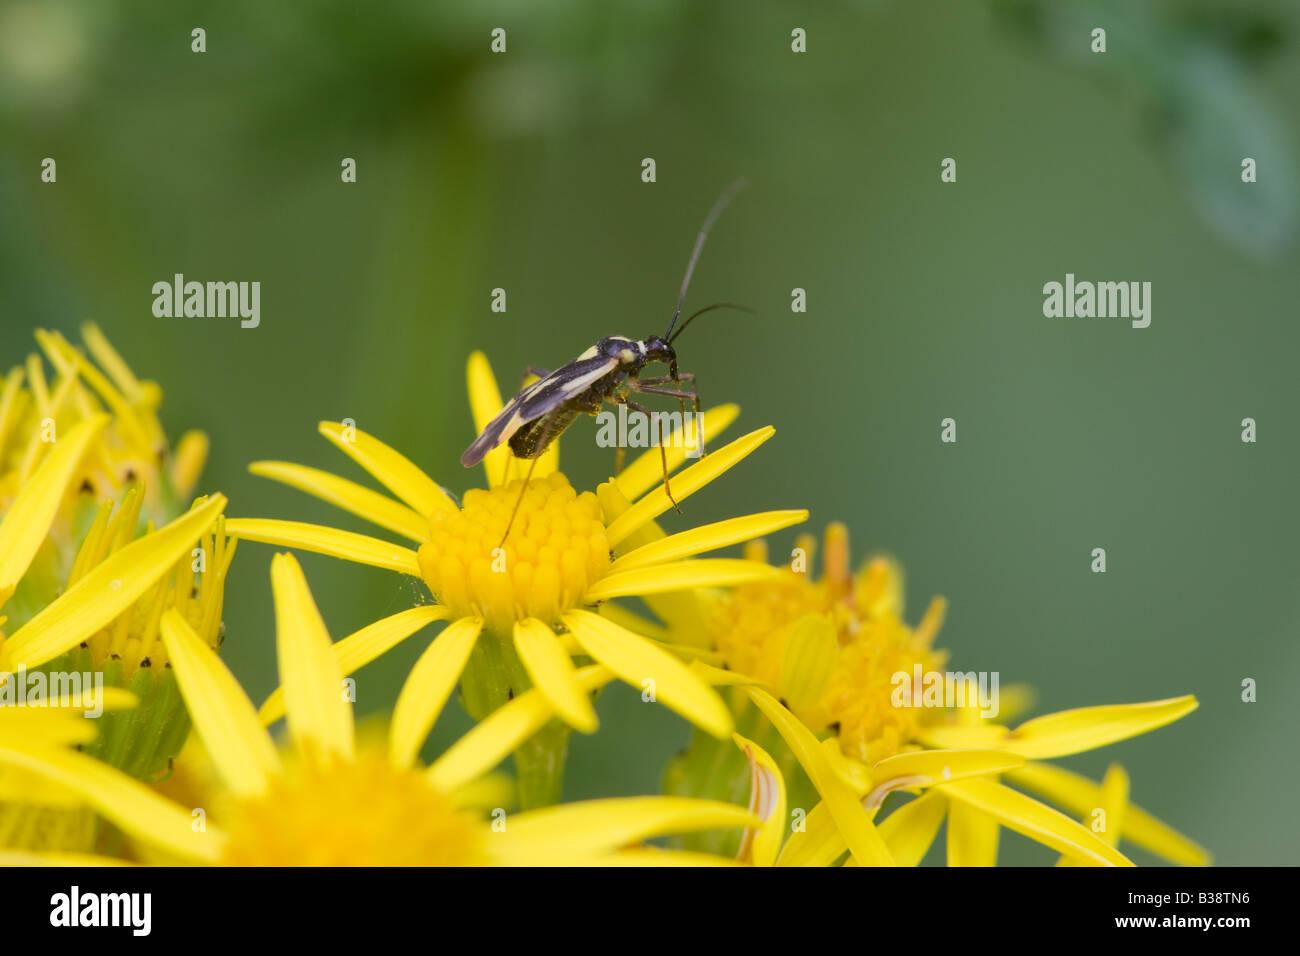 Mirid (Capsid) Bug Miridae species perched on a Common Ragwort Senecio jacobaea flower - Stock Image